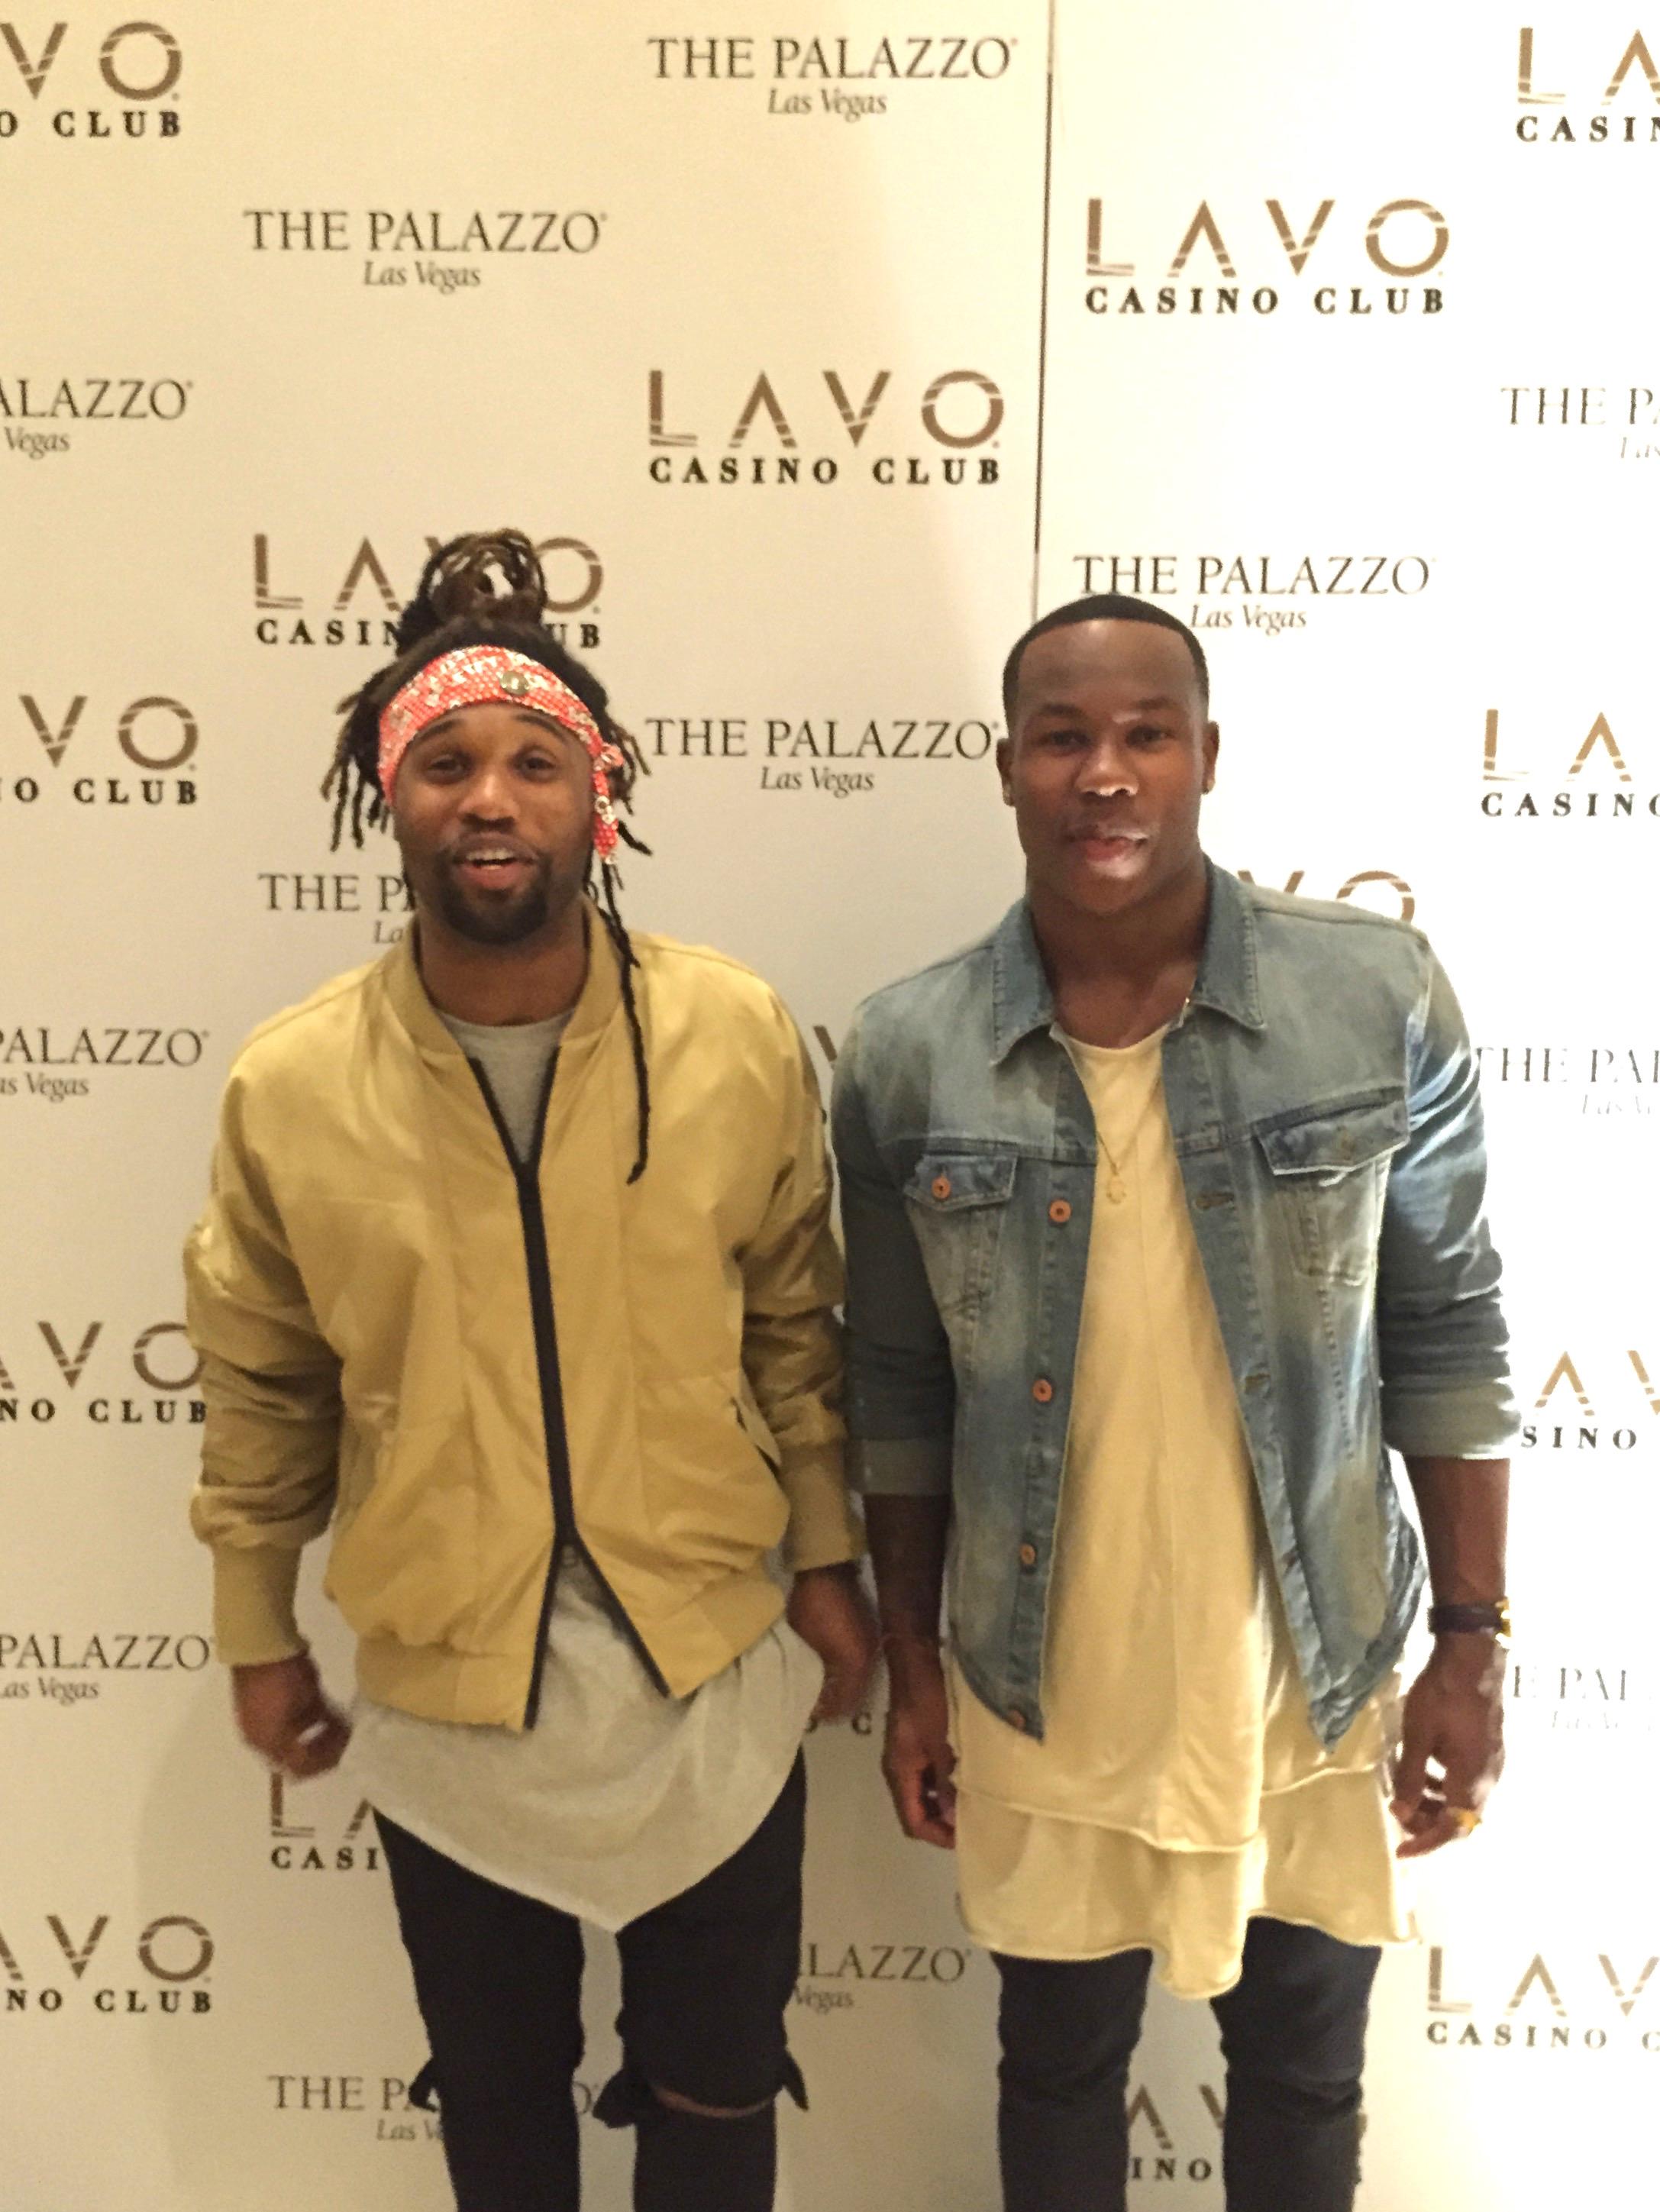 Omar Bolden and Duke Ihenacho at Lavo Casino Club